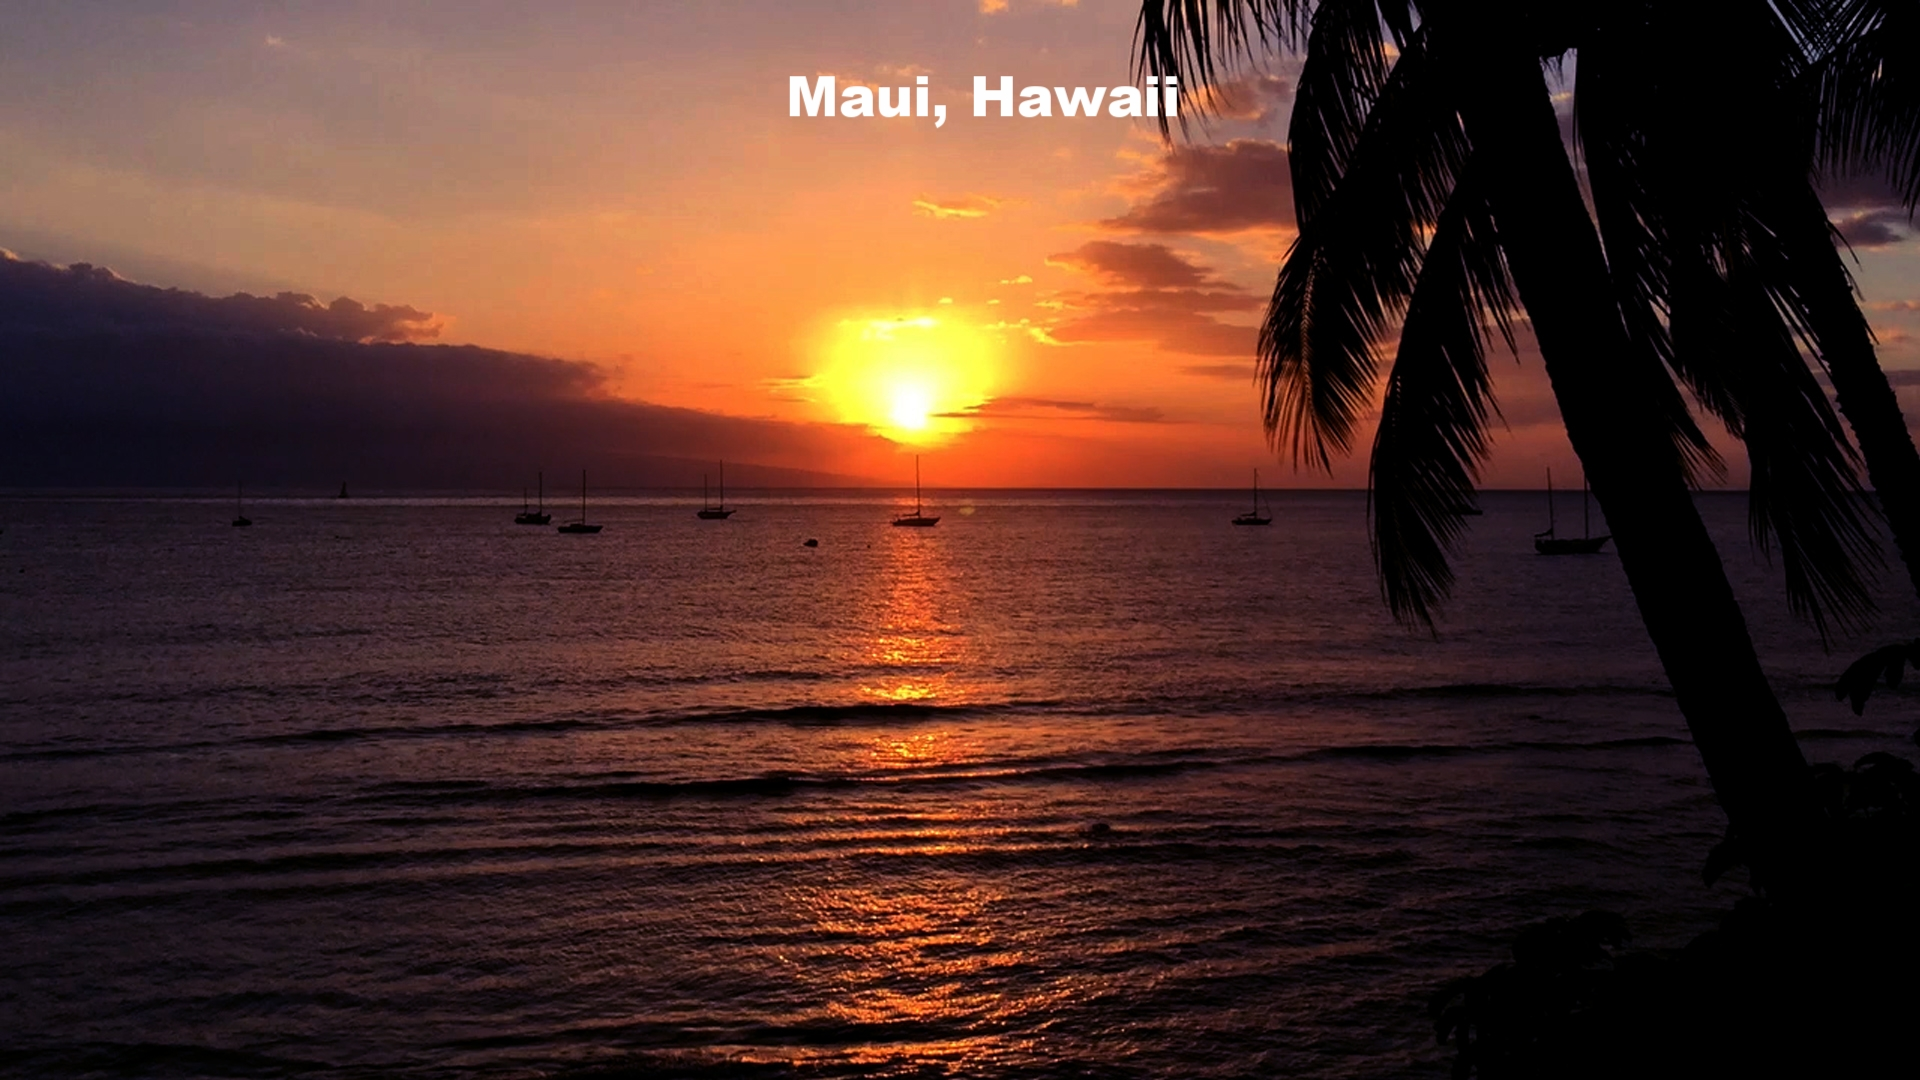 Maui_Hawaii.jpg